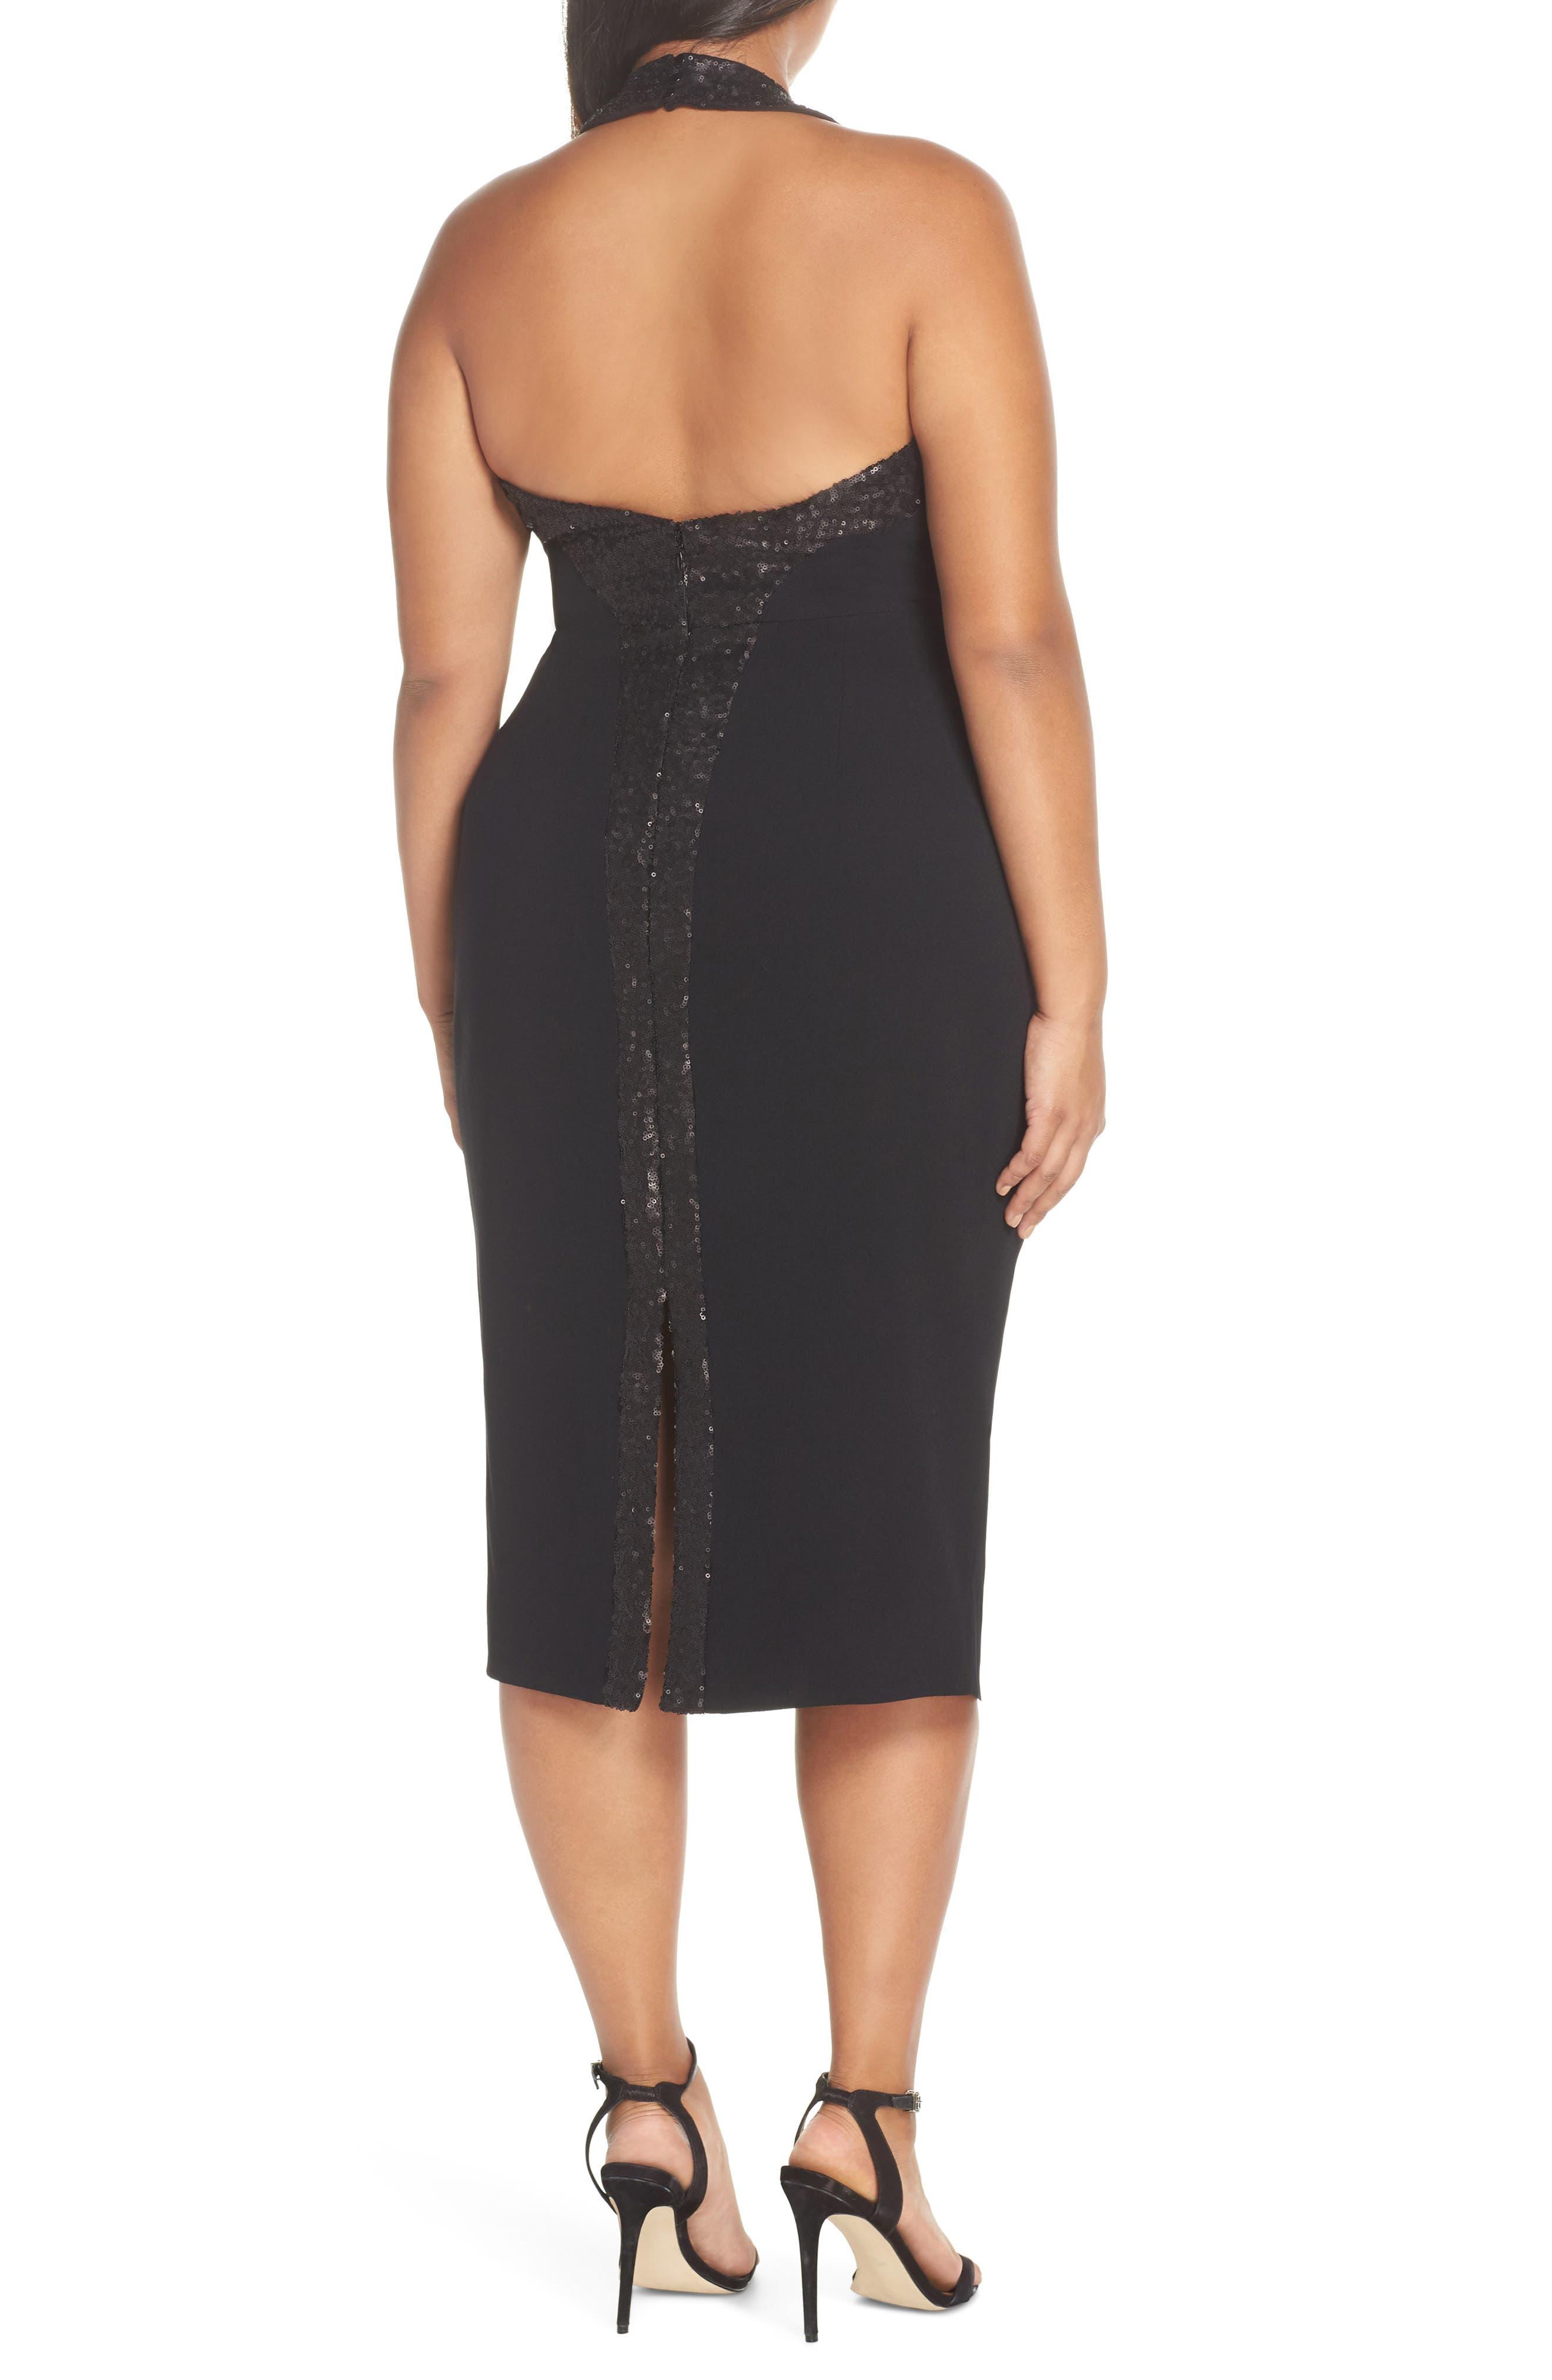 Cleo Halter Dress,                             Alternate thumbnail 7, color,                             BLACK/ BLACK